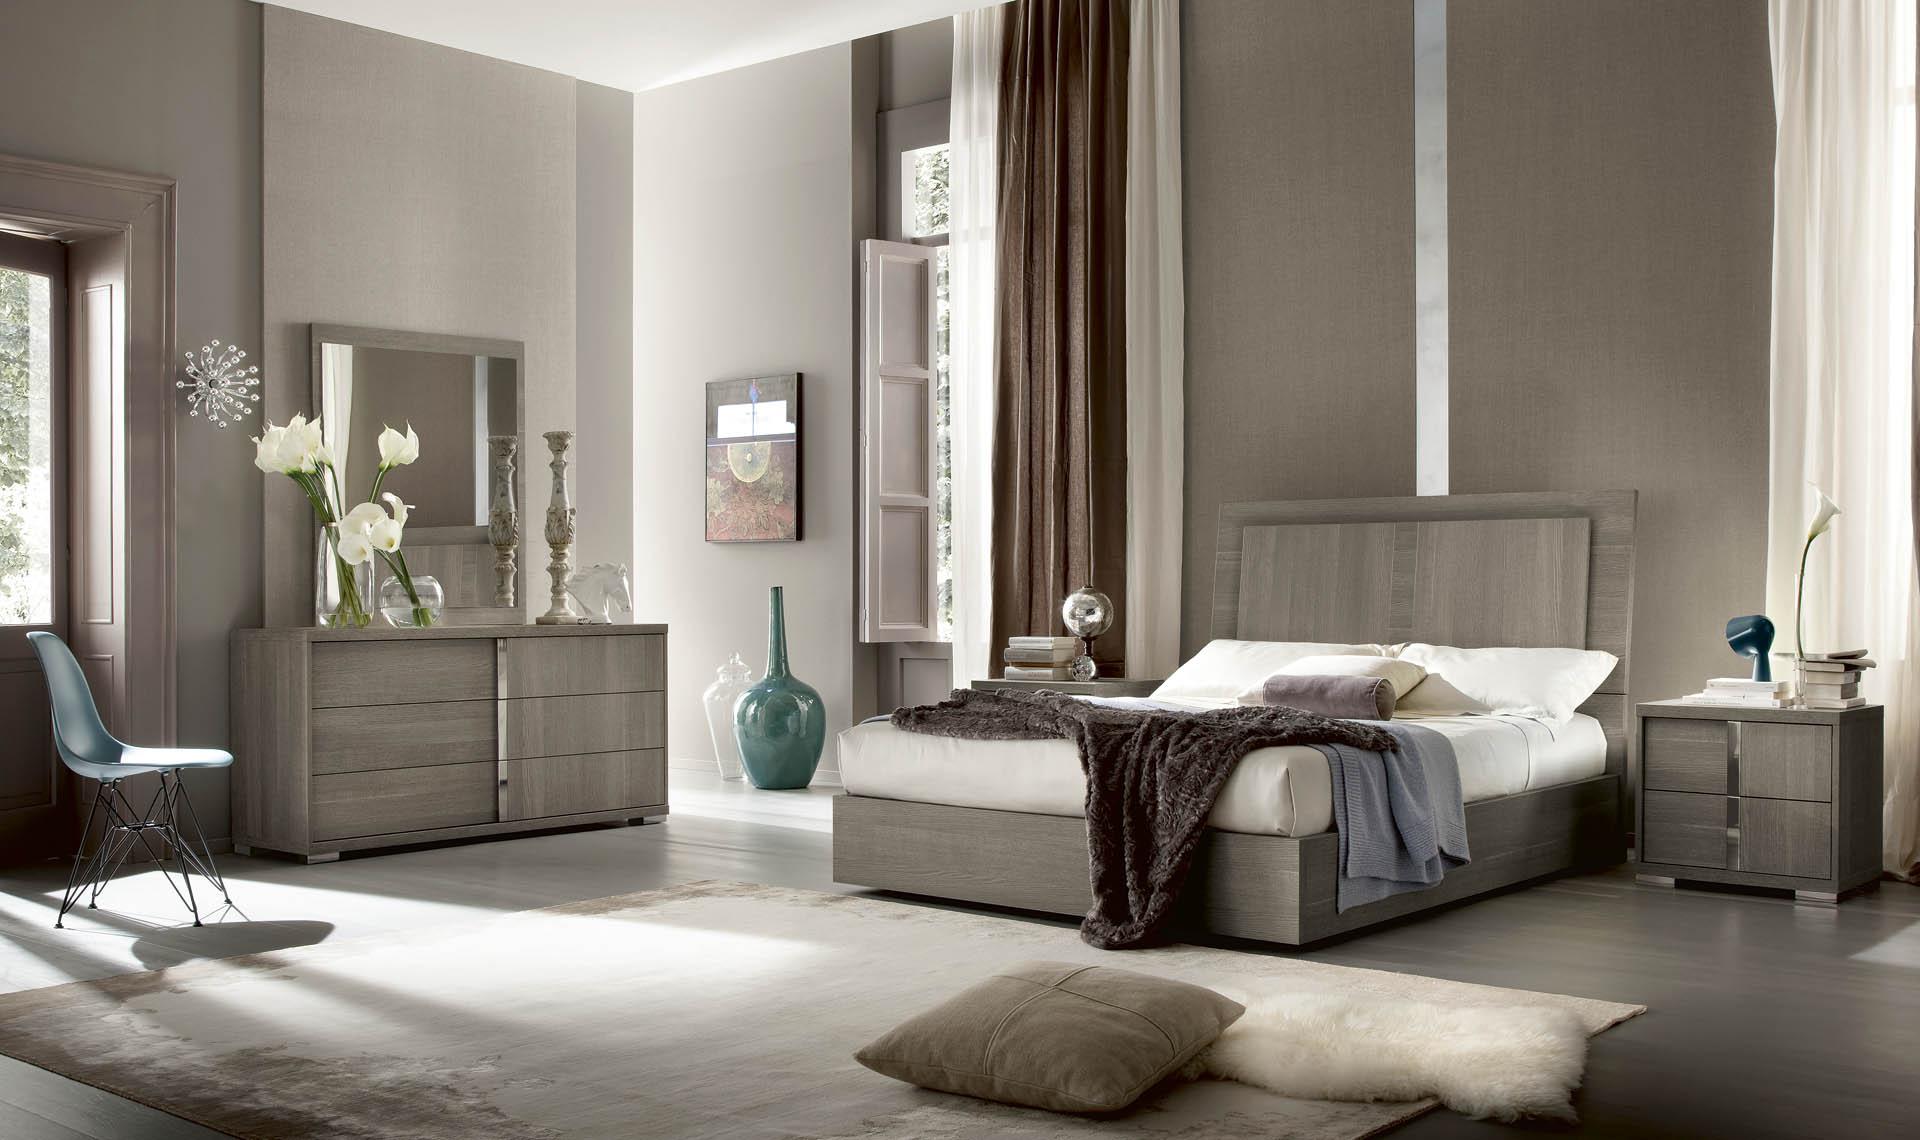 Tivoli Bedroom Overview